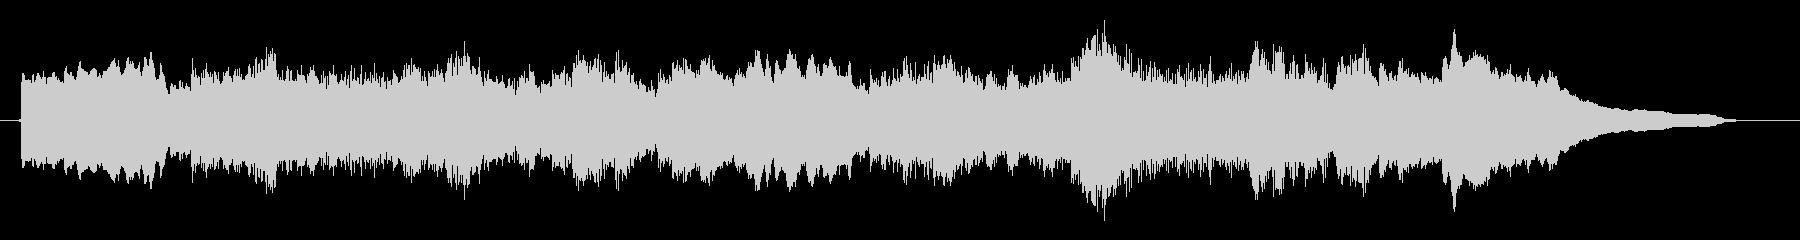 Cinematic Piano&Strings 1の未再生の波形